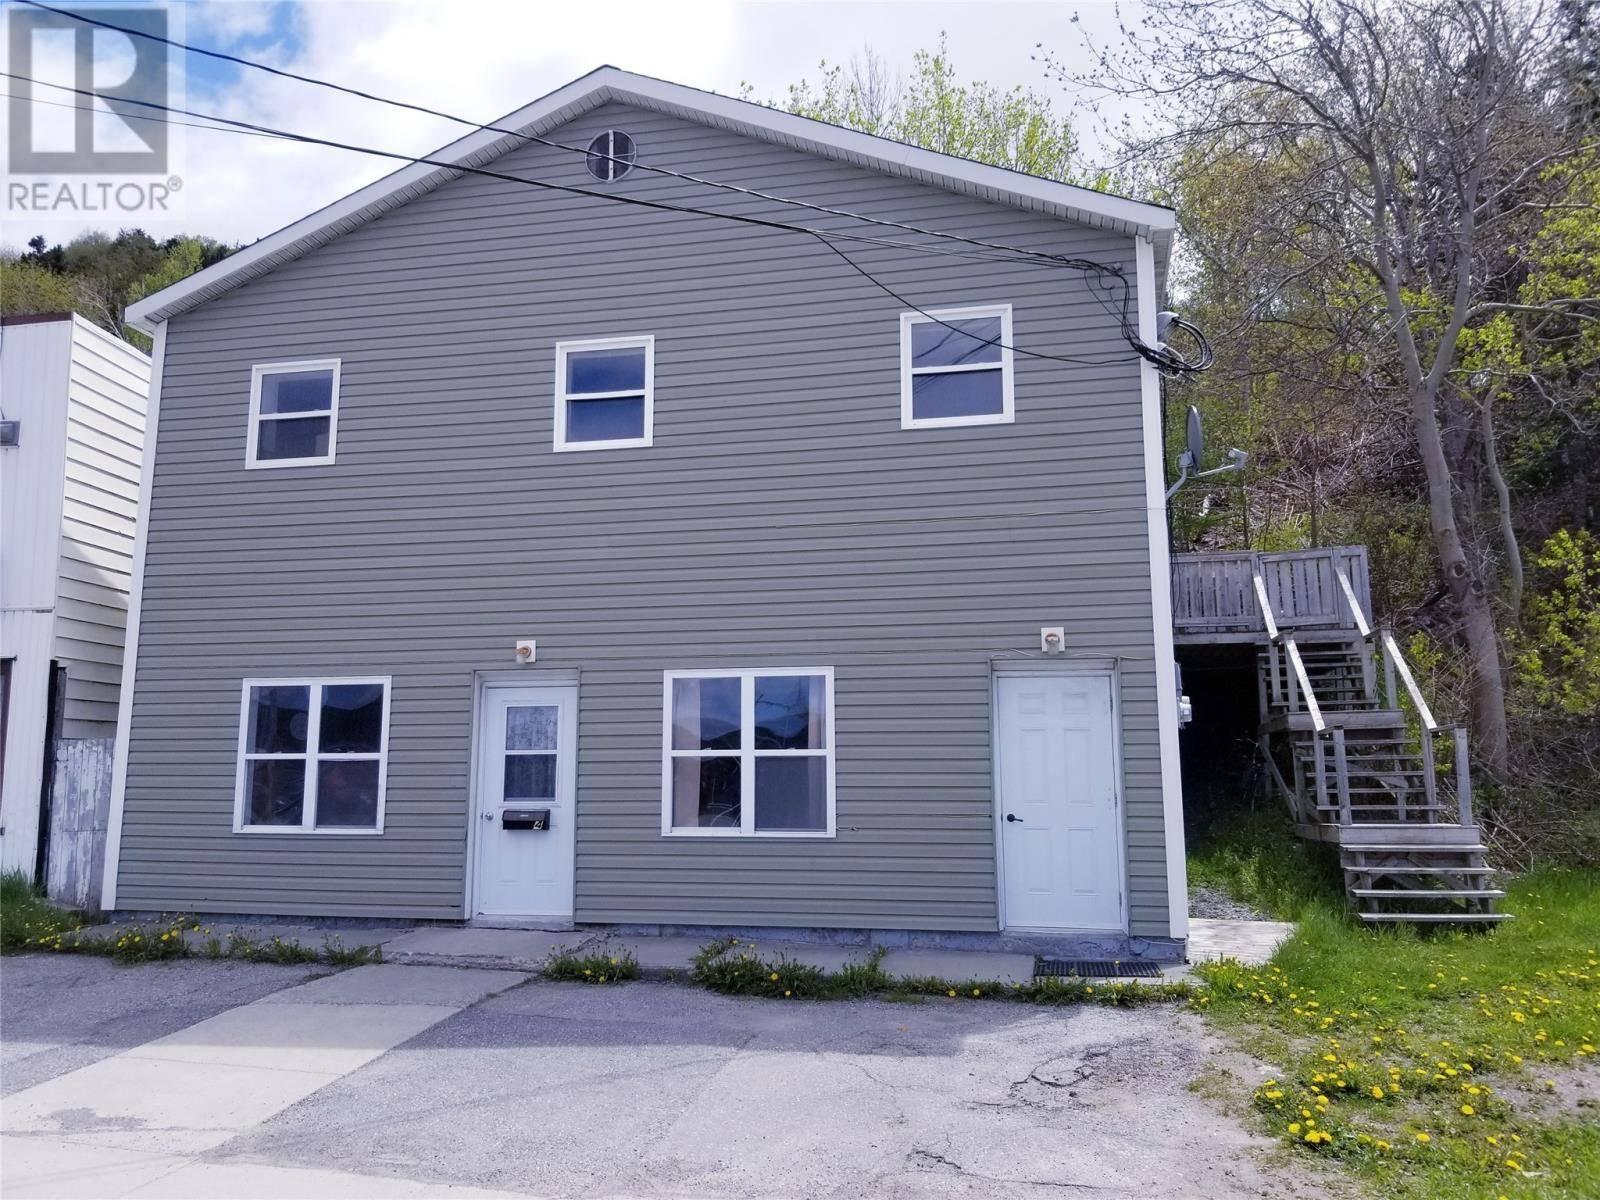 House for sale at 2 Humber Rd Corner Brook Newfoundland - MLS: 1197462